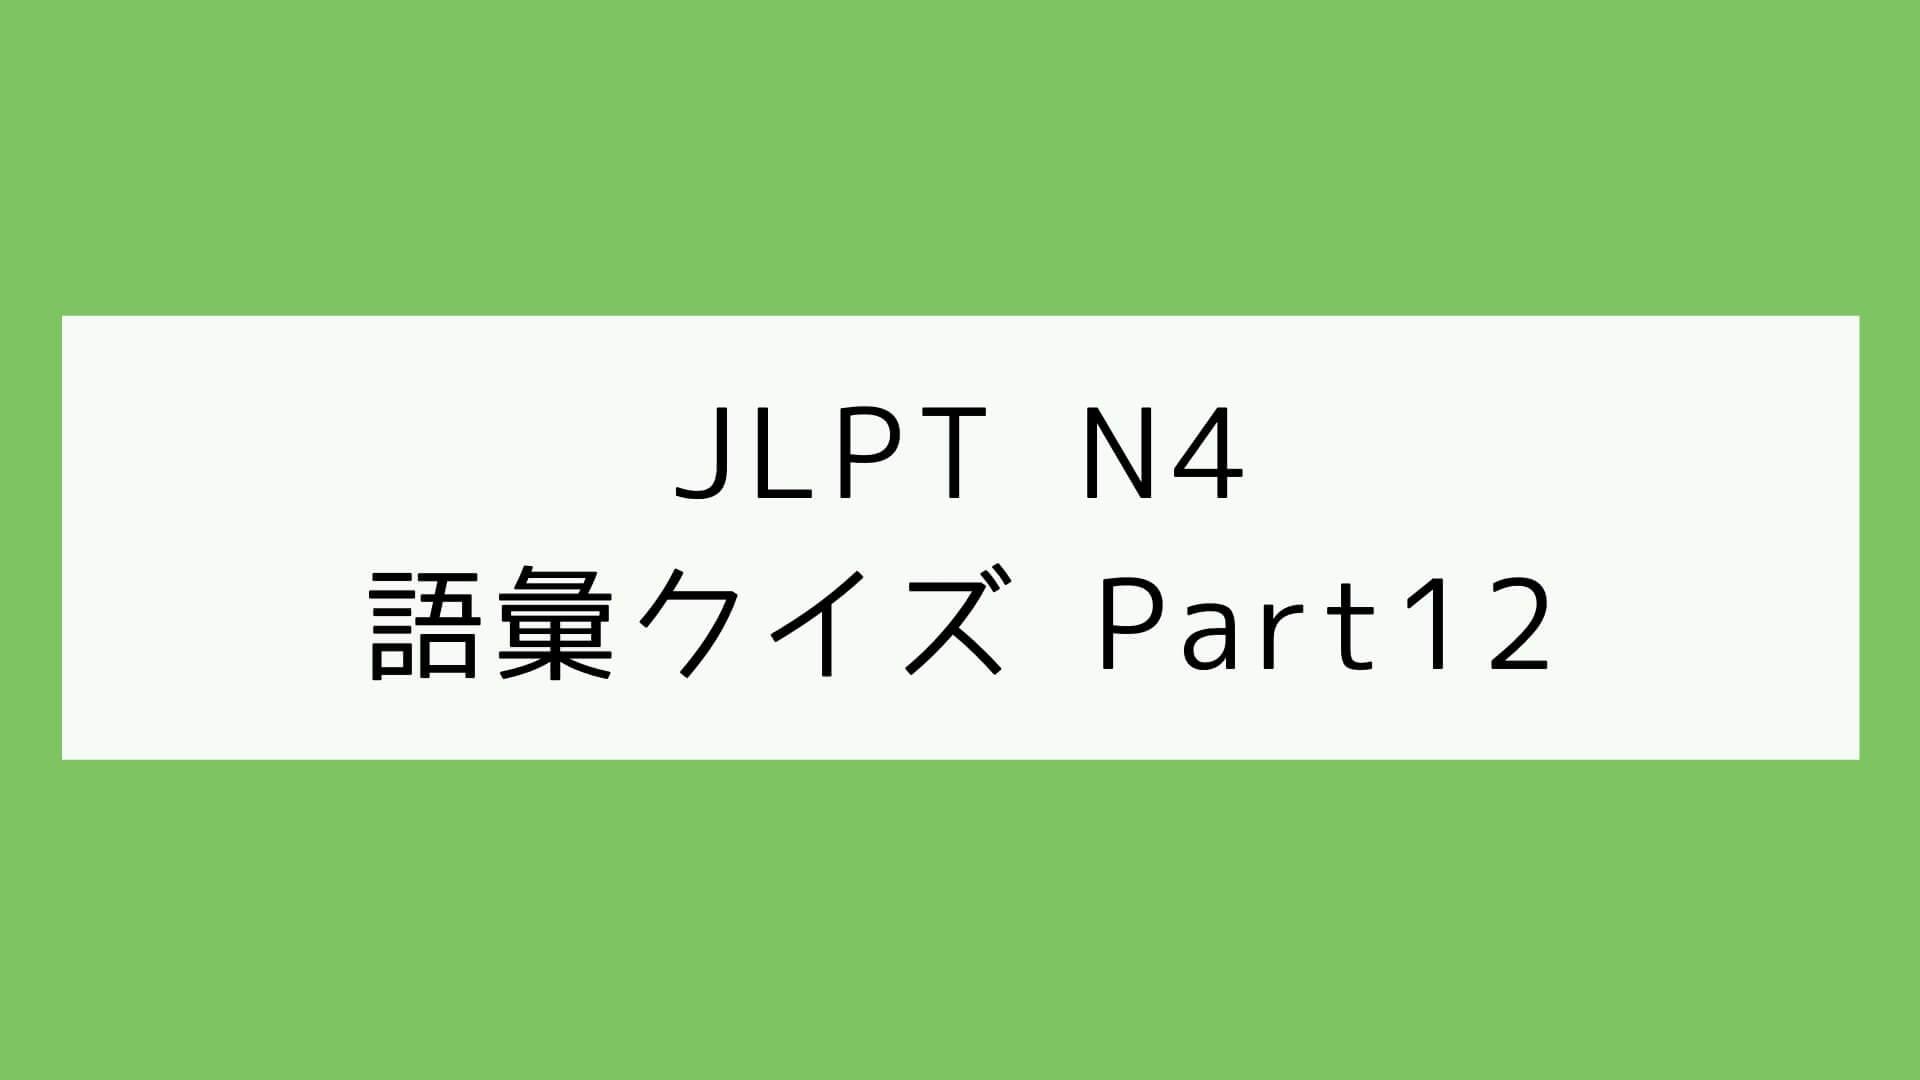 【JLPT N4】語彙クイズ Part12